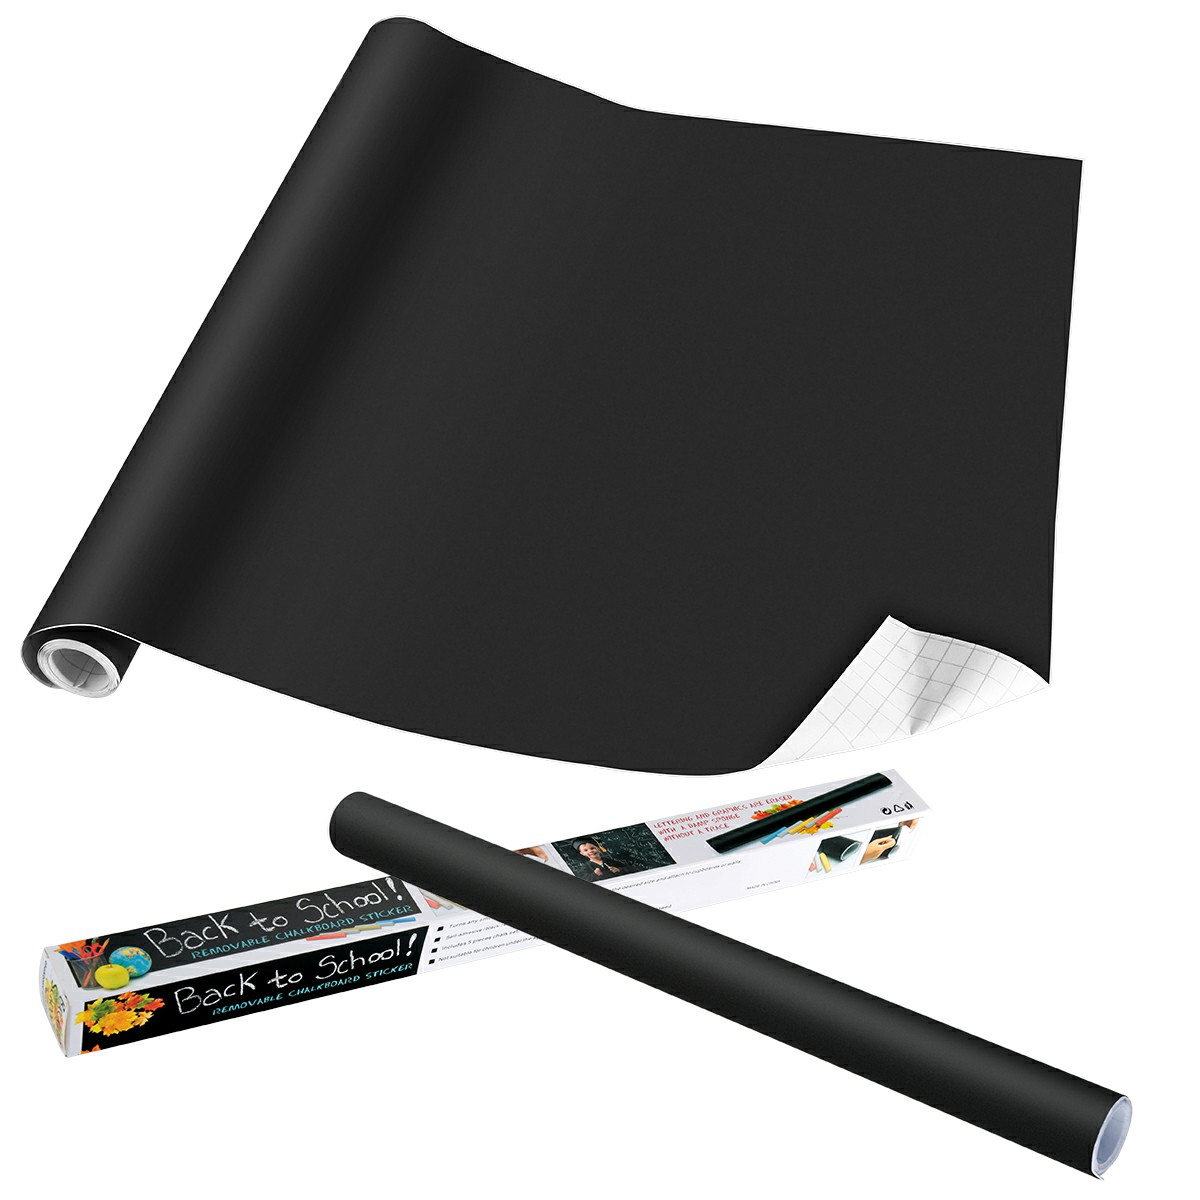 45x200cm Dry Wipe Blackboard Removable Vinyl Wall Sticker Decal for Office Home School